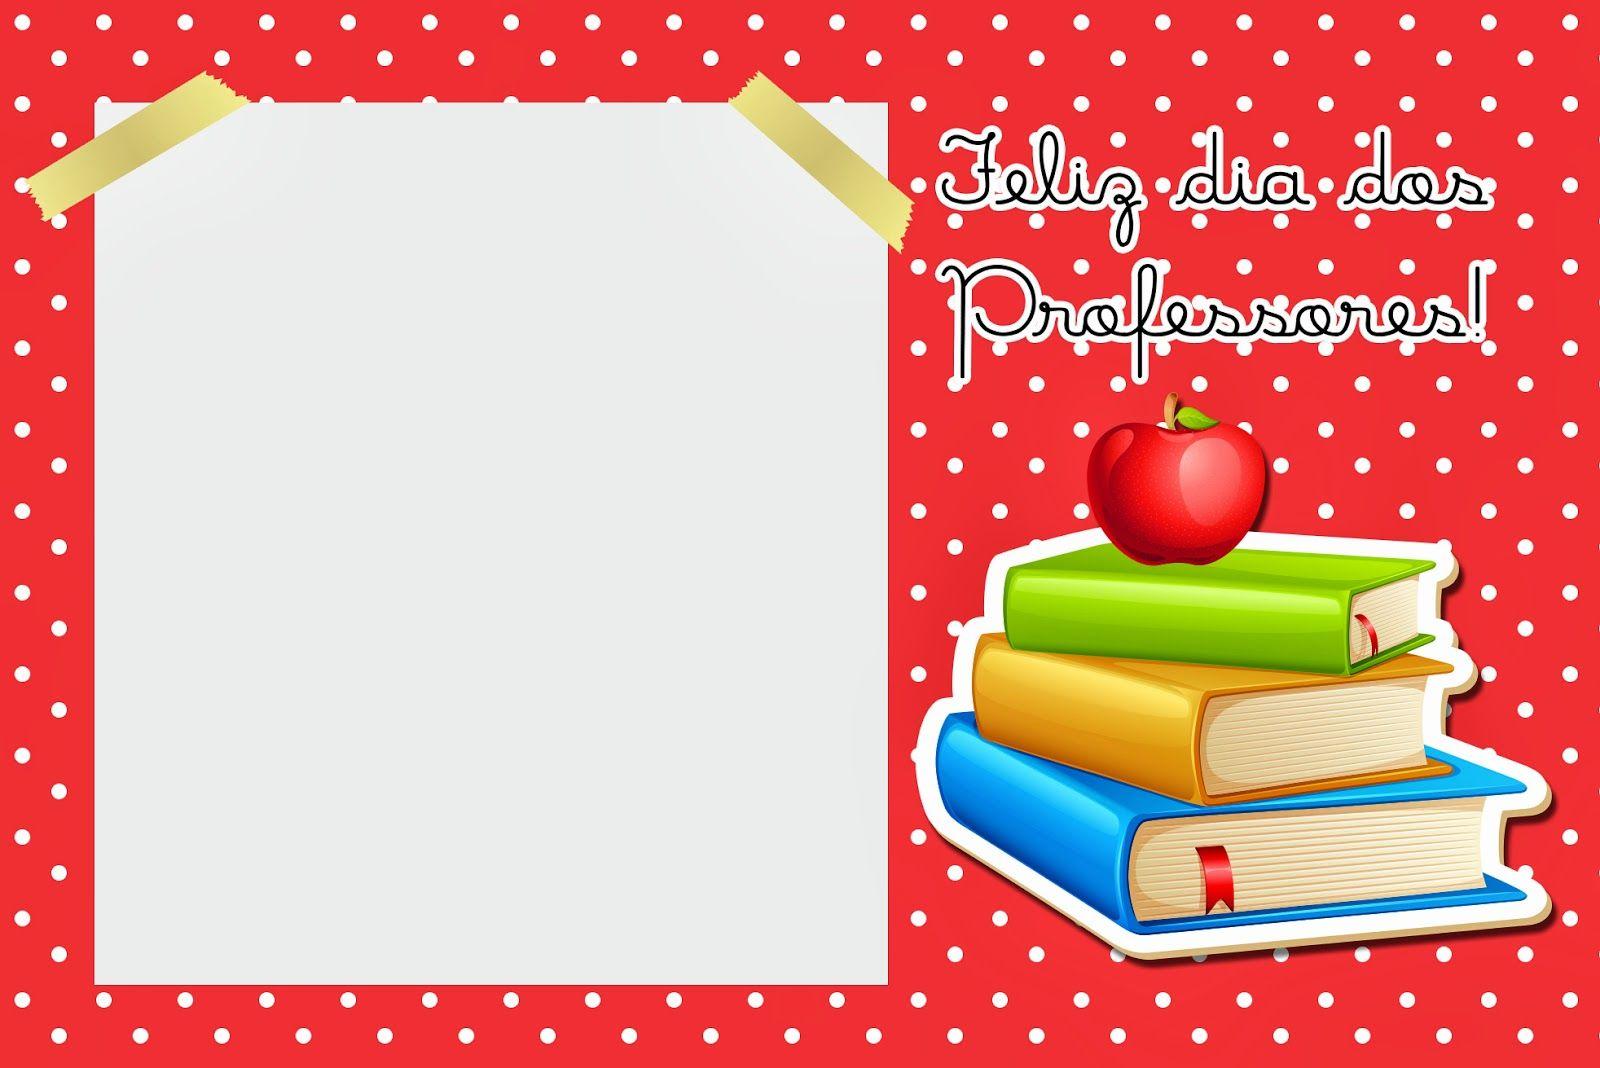 Dia dos Professores - Mini Kit com molduras para convites, rótulos ...